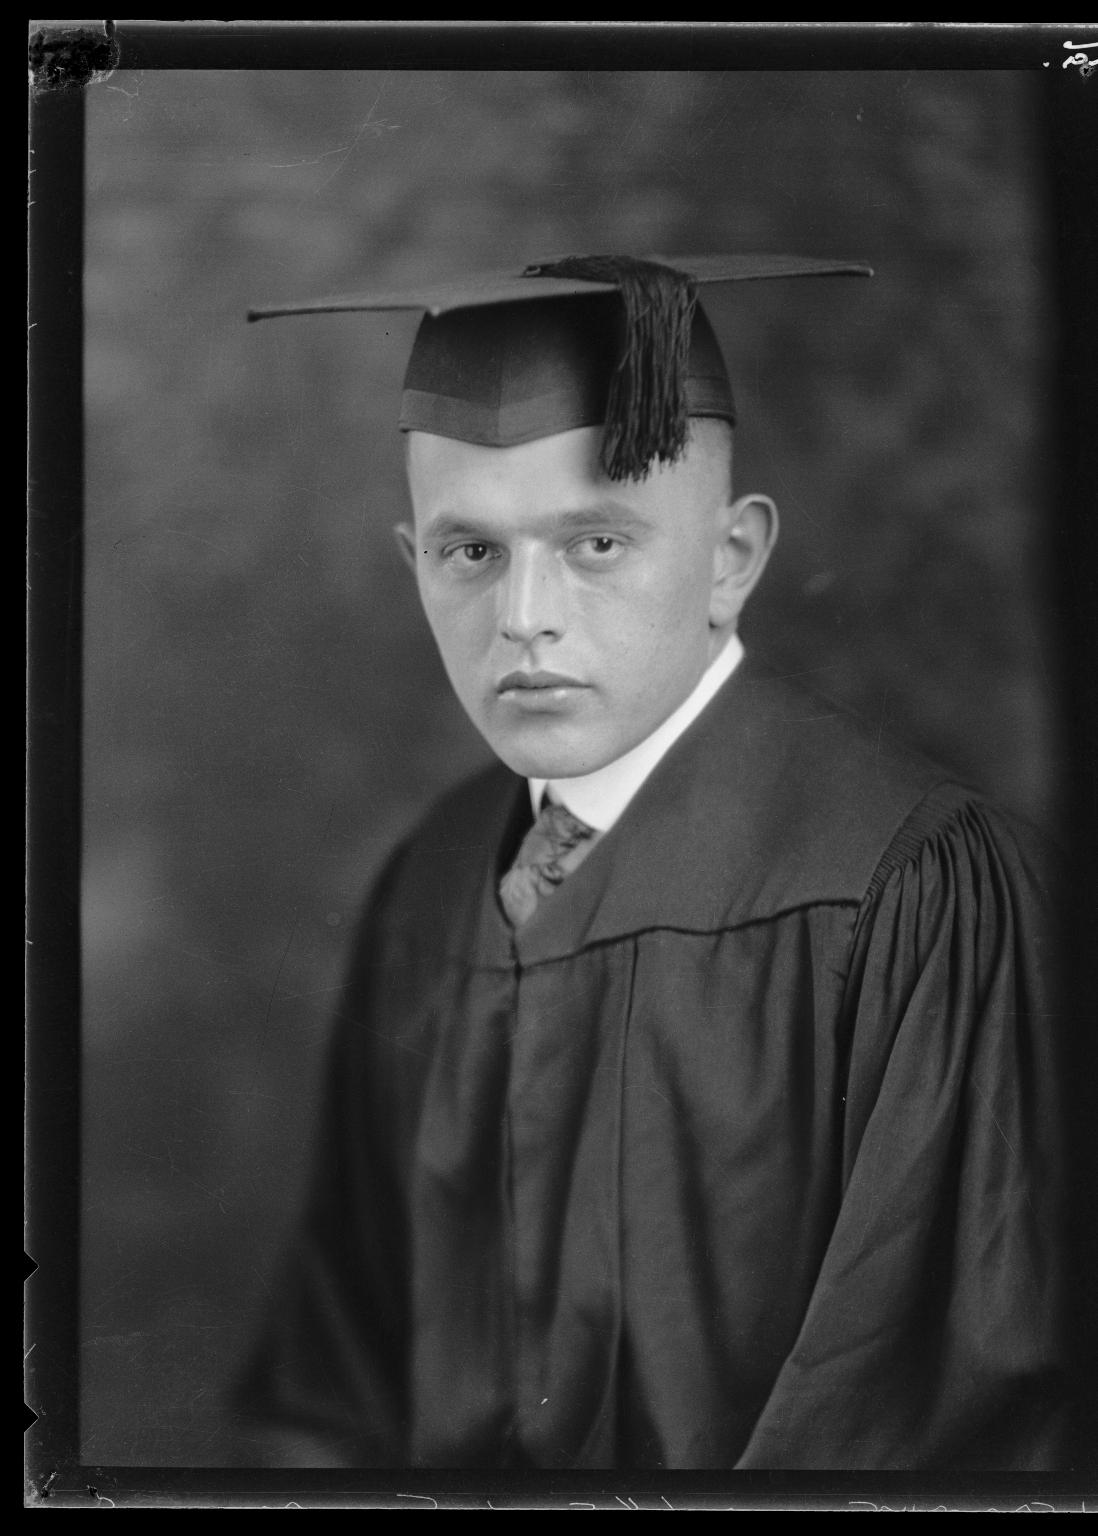 Portraits of H. L. Hinkley